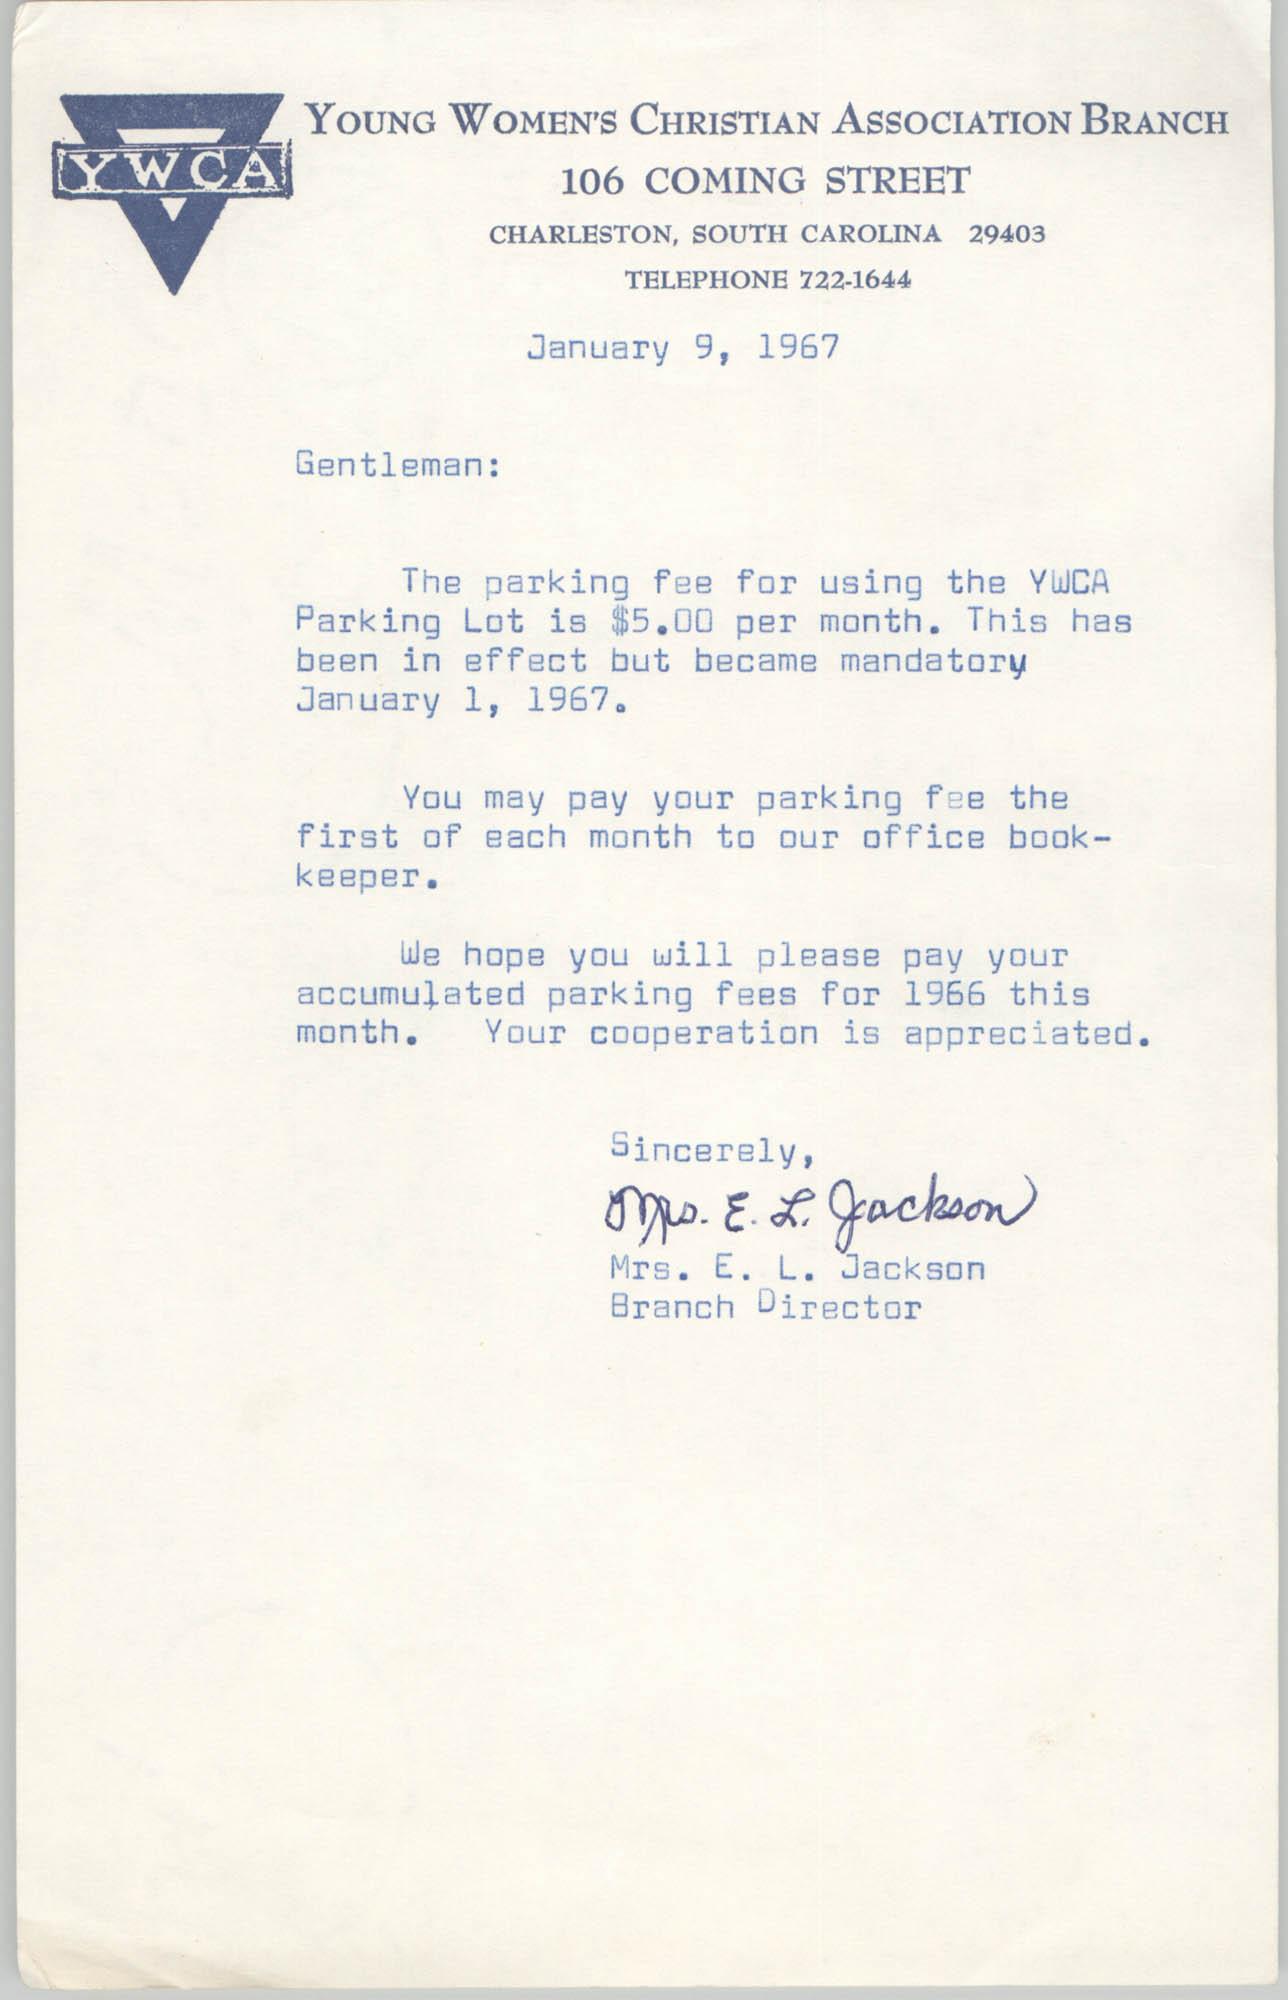 Letter from Christine O. Jackson to Arthur Jackson, January 9, 1967